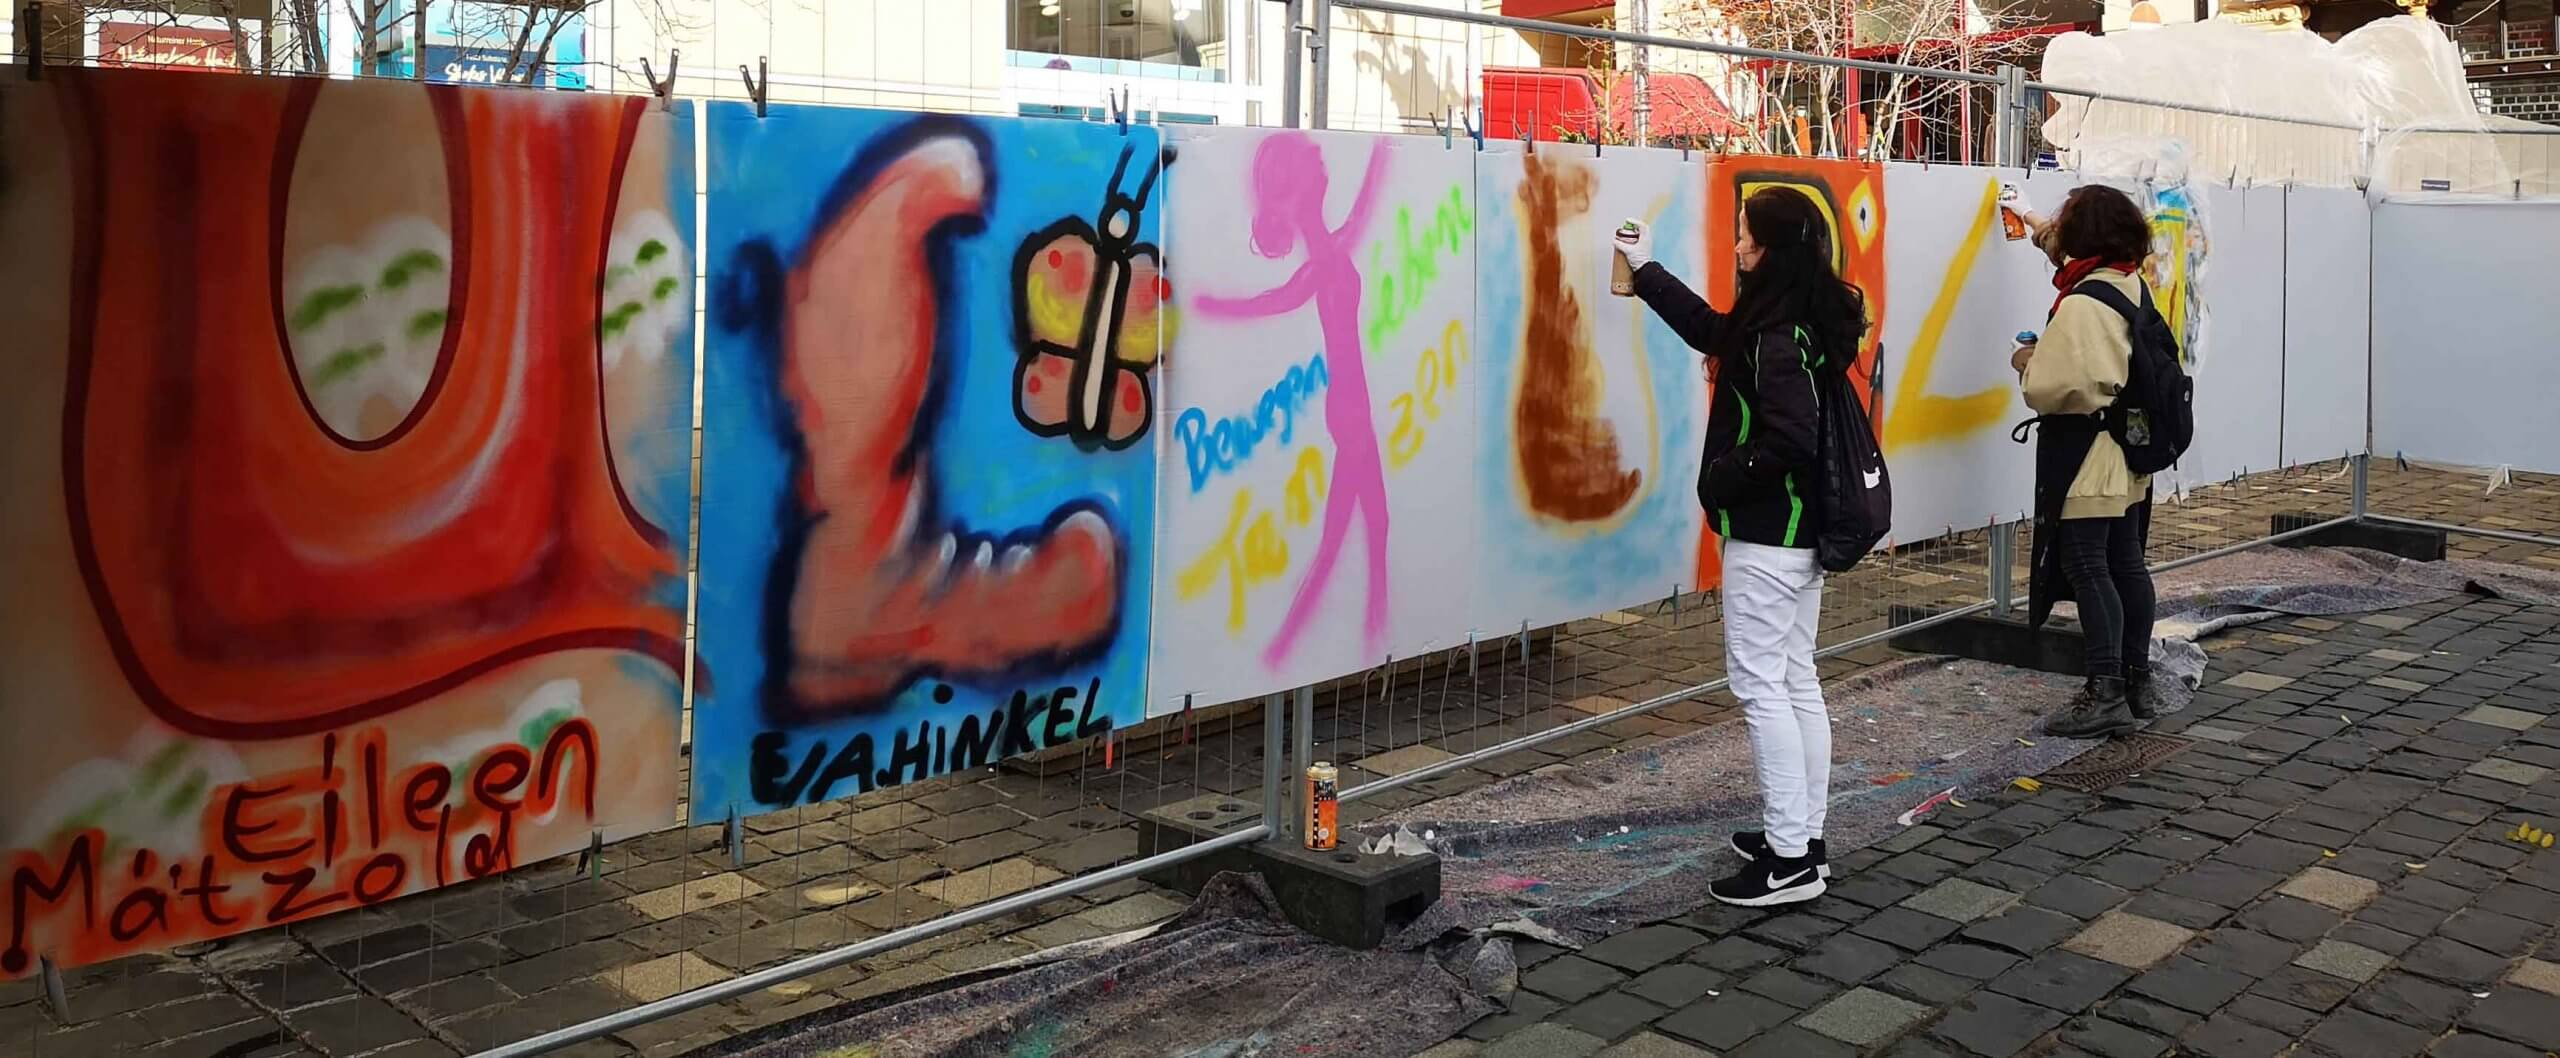 Kulturliebhaberbeutel-Motiv, Foto: Ralf Hecht